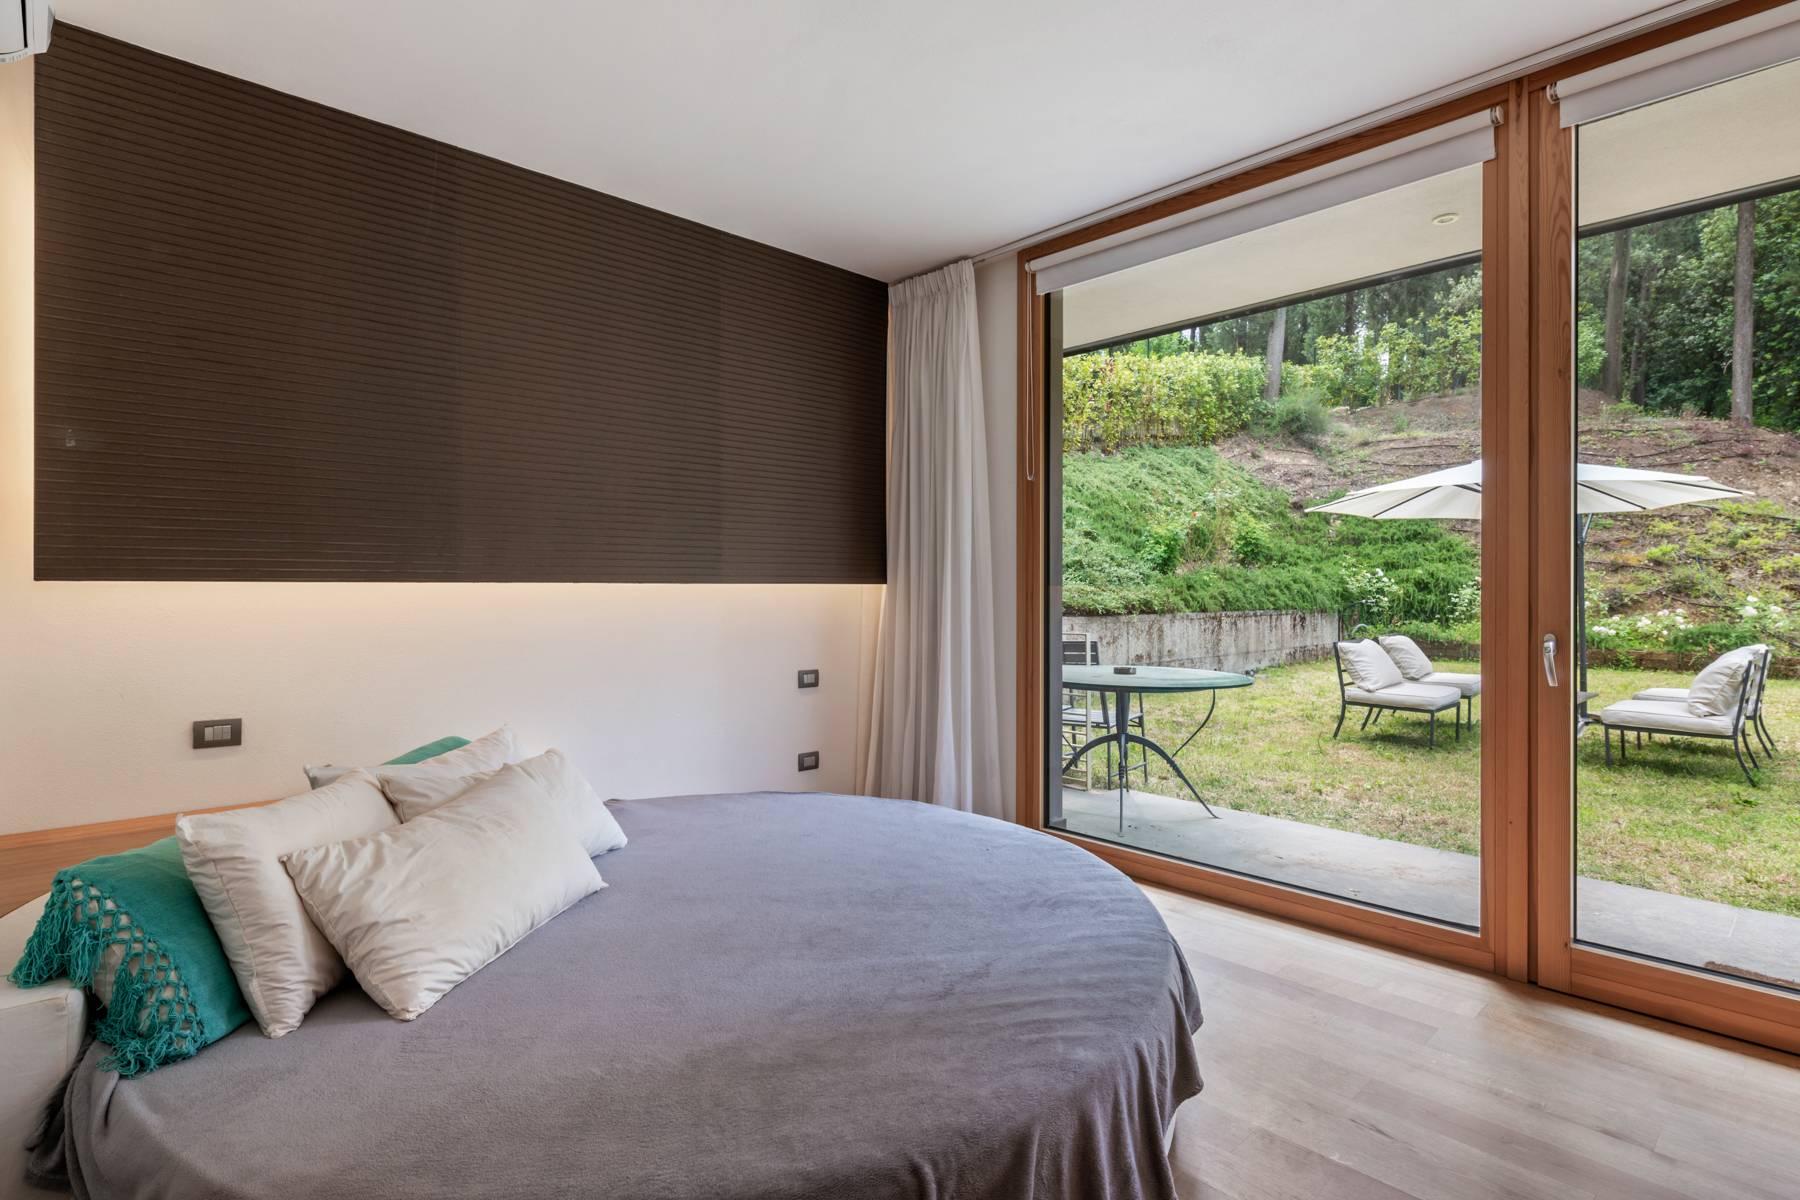 Appartamento in Vendita a Pontassieve: 5 locali, 300 mq - Foto 13